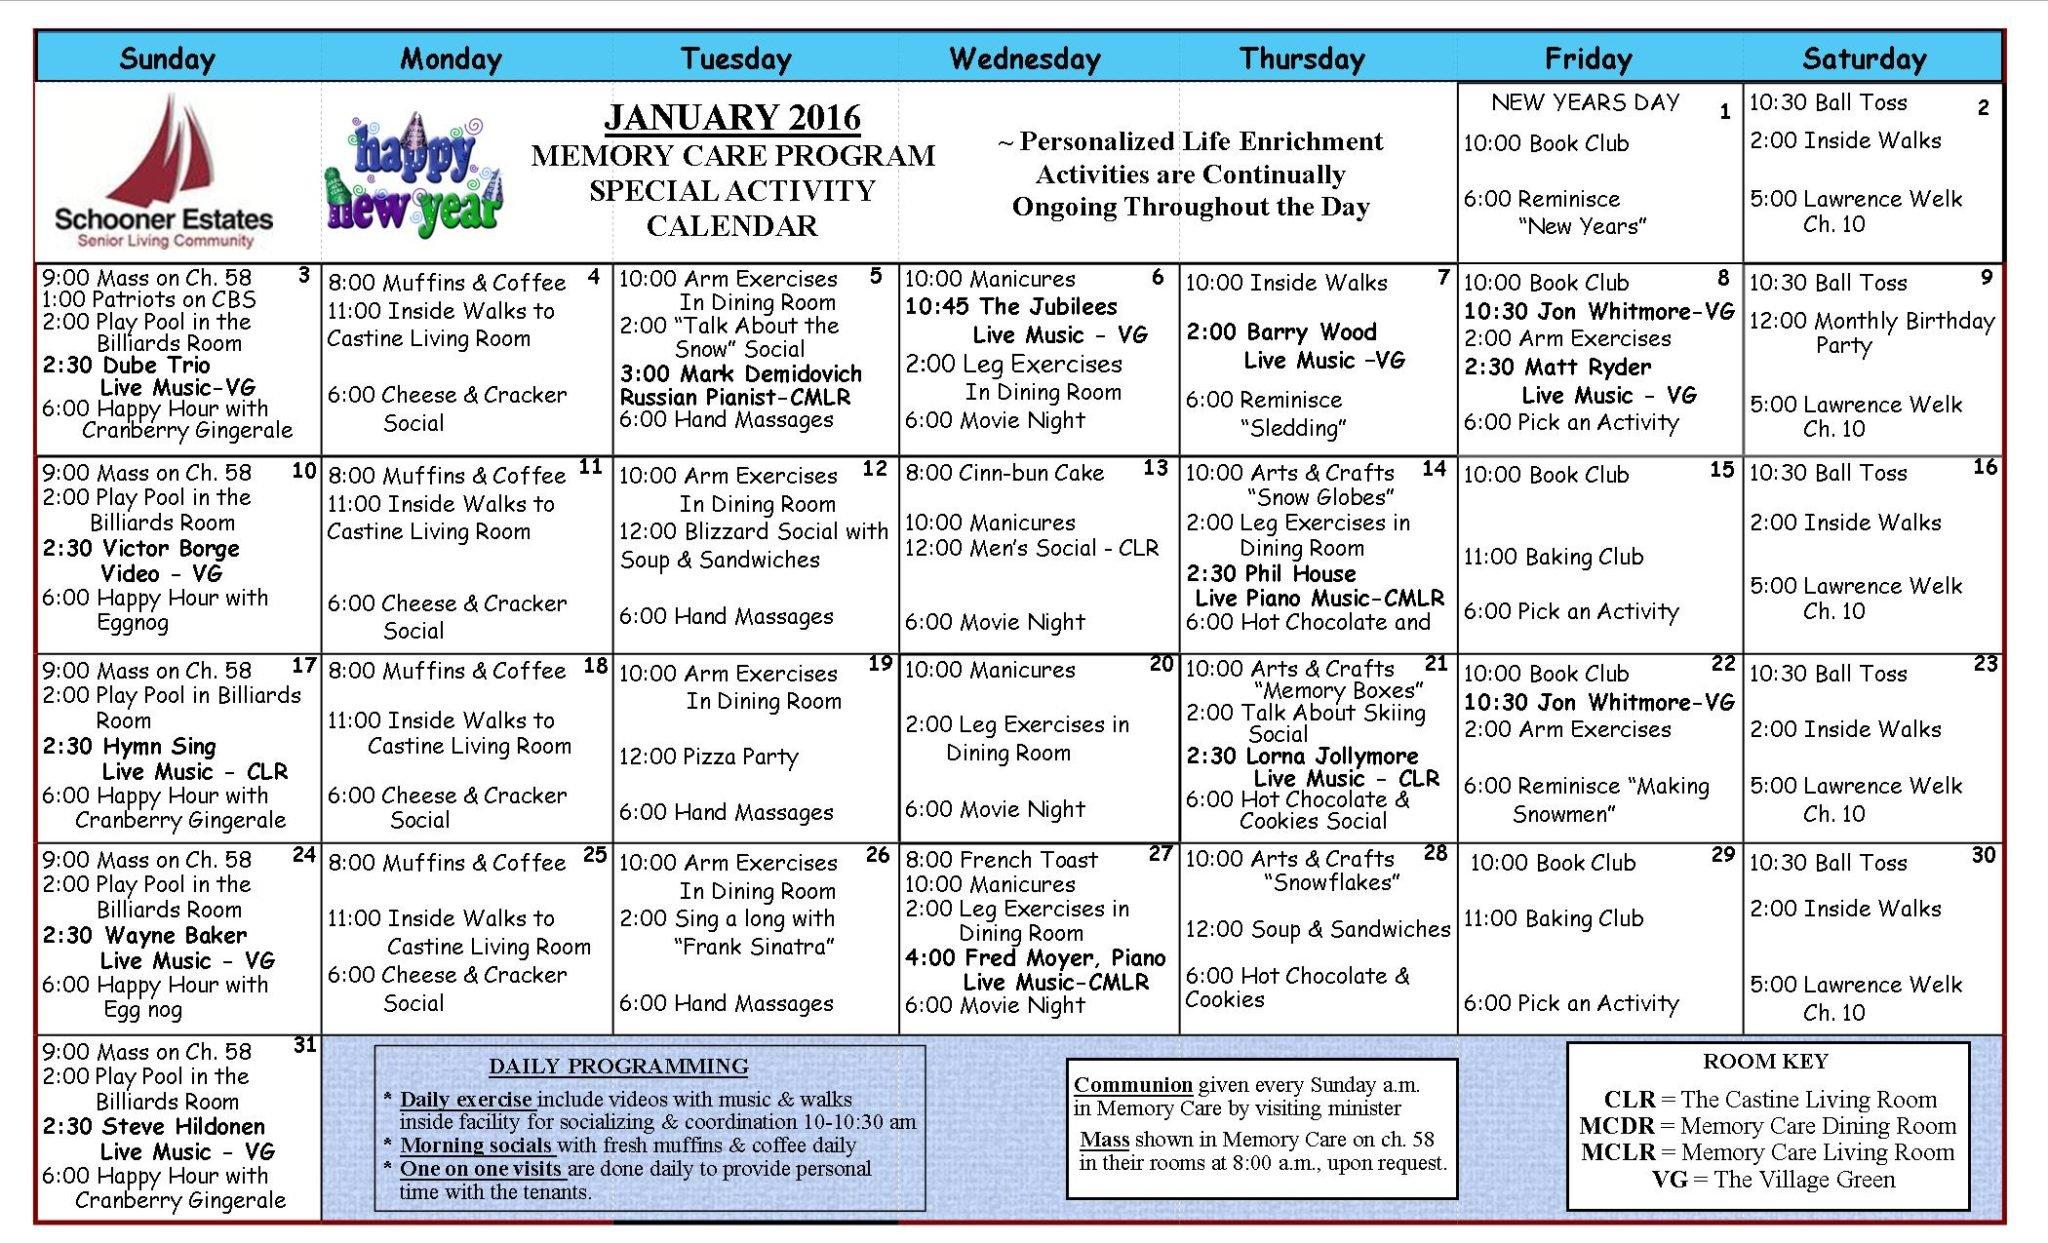 January 2016 Memory Care Activity Calendar